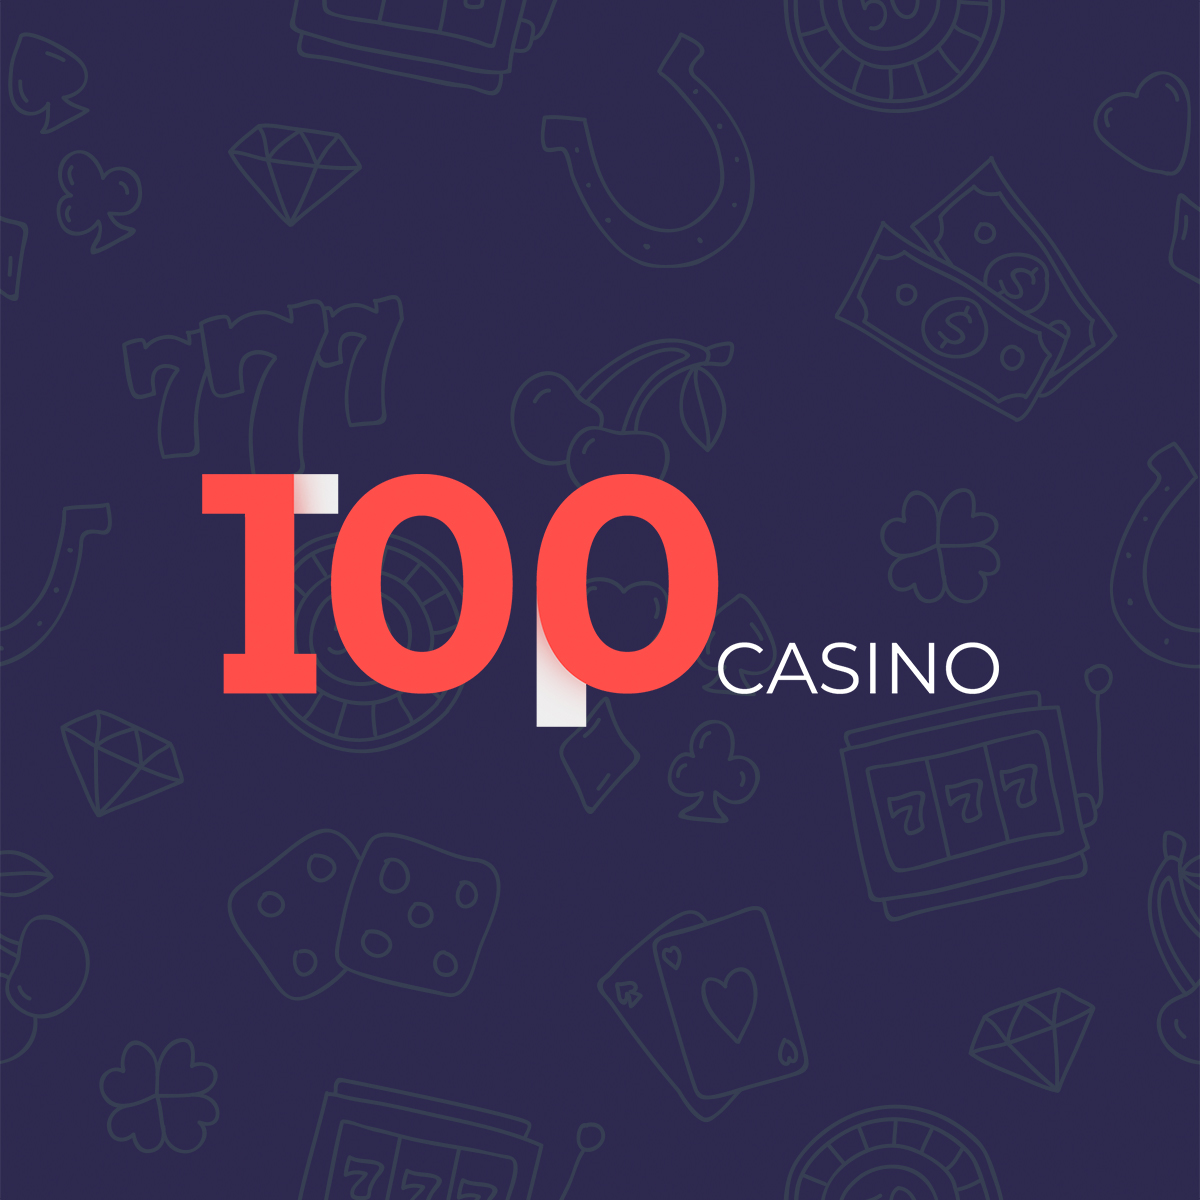 Rango casino online apostas 51723